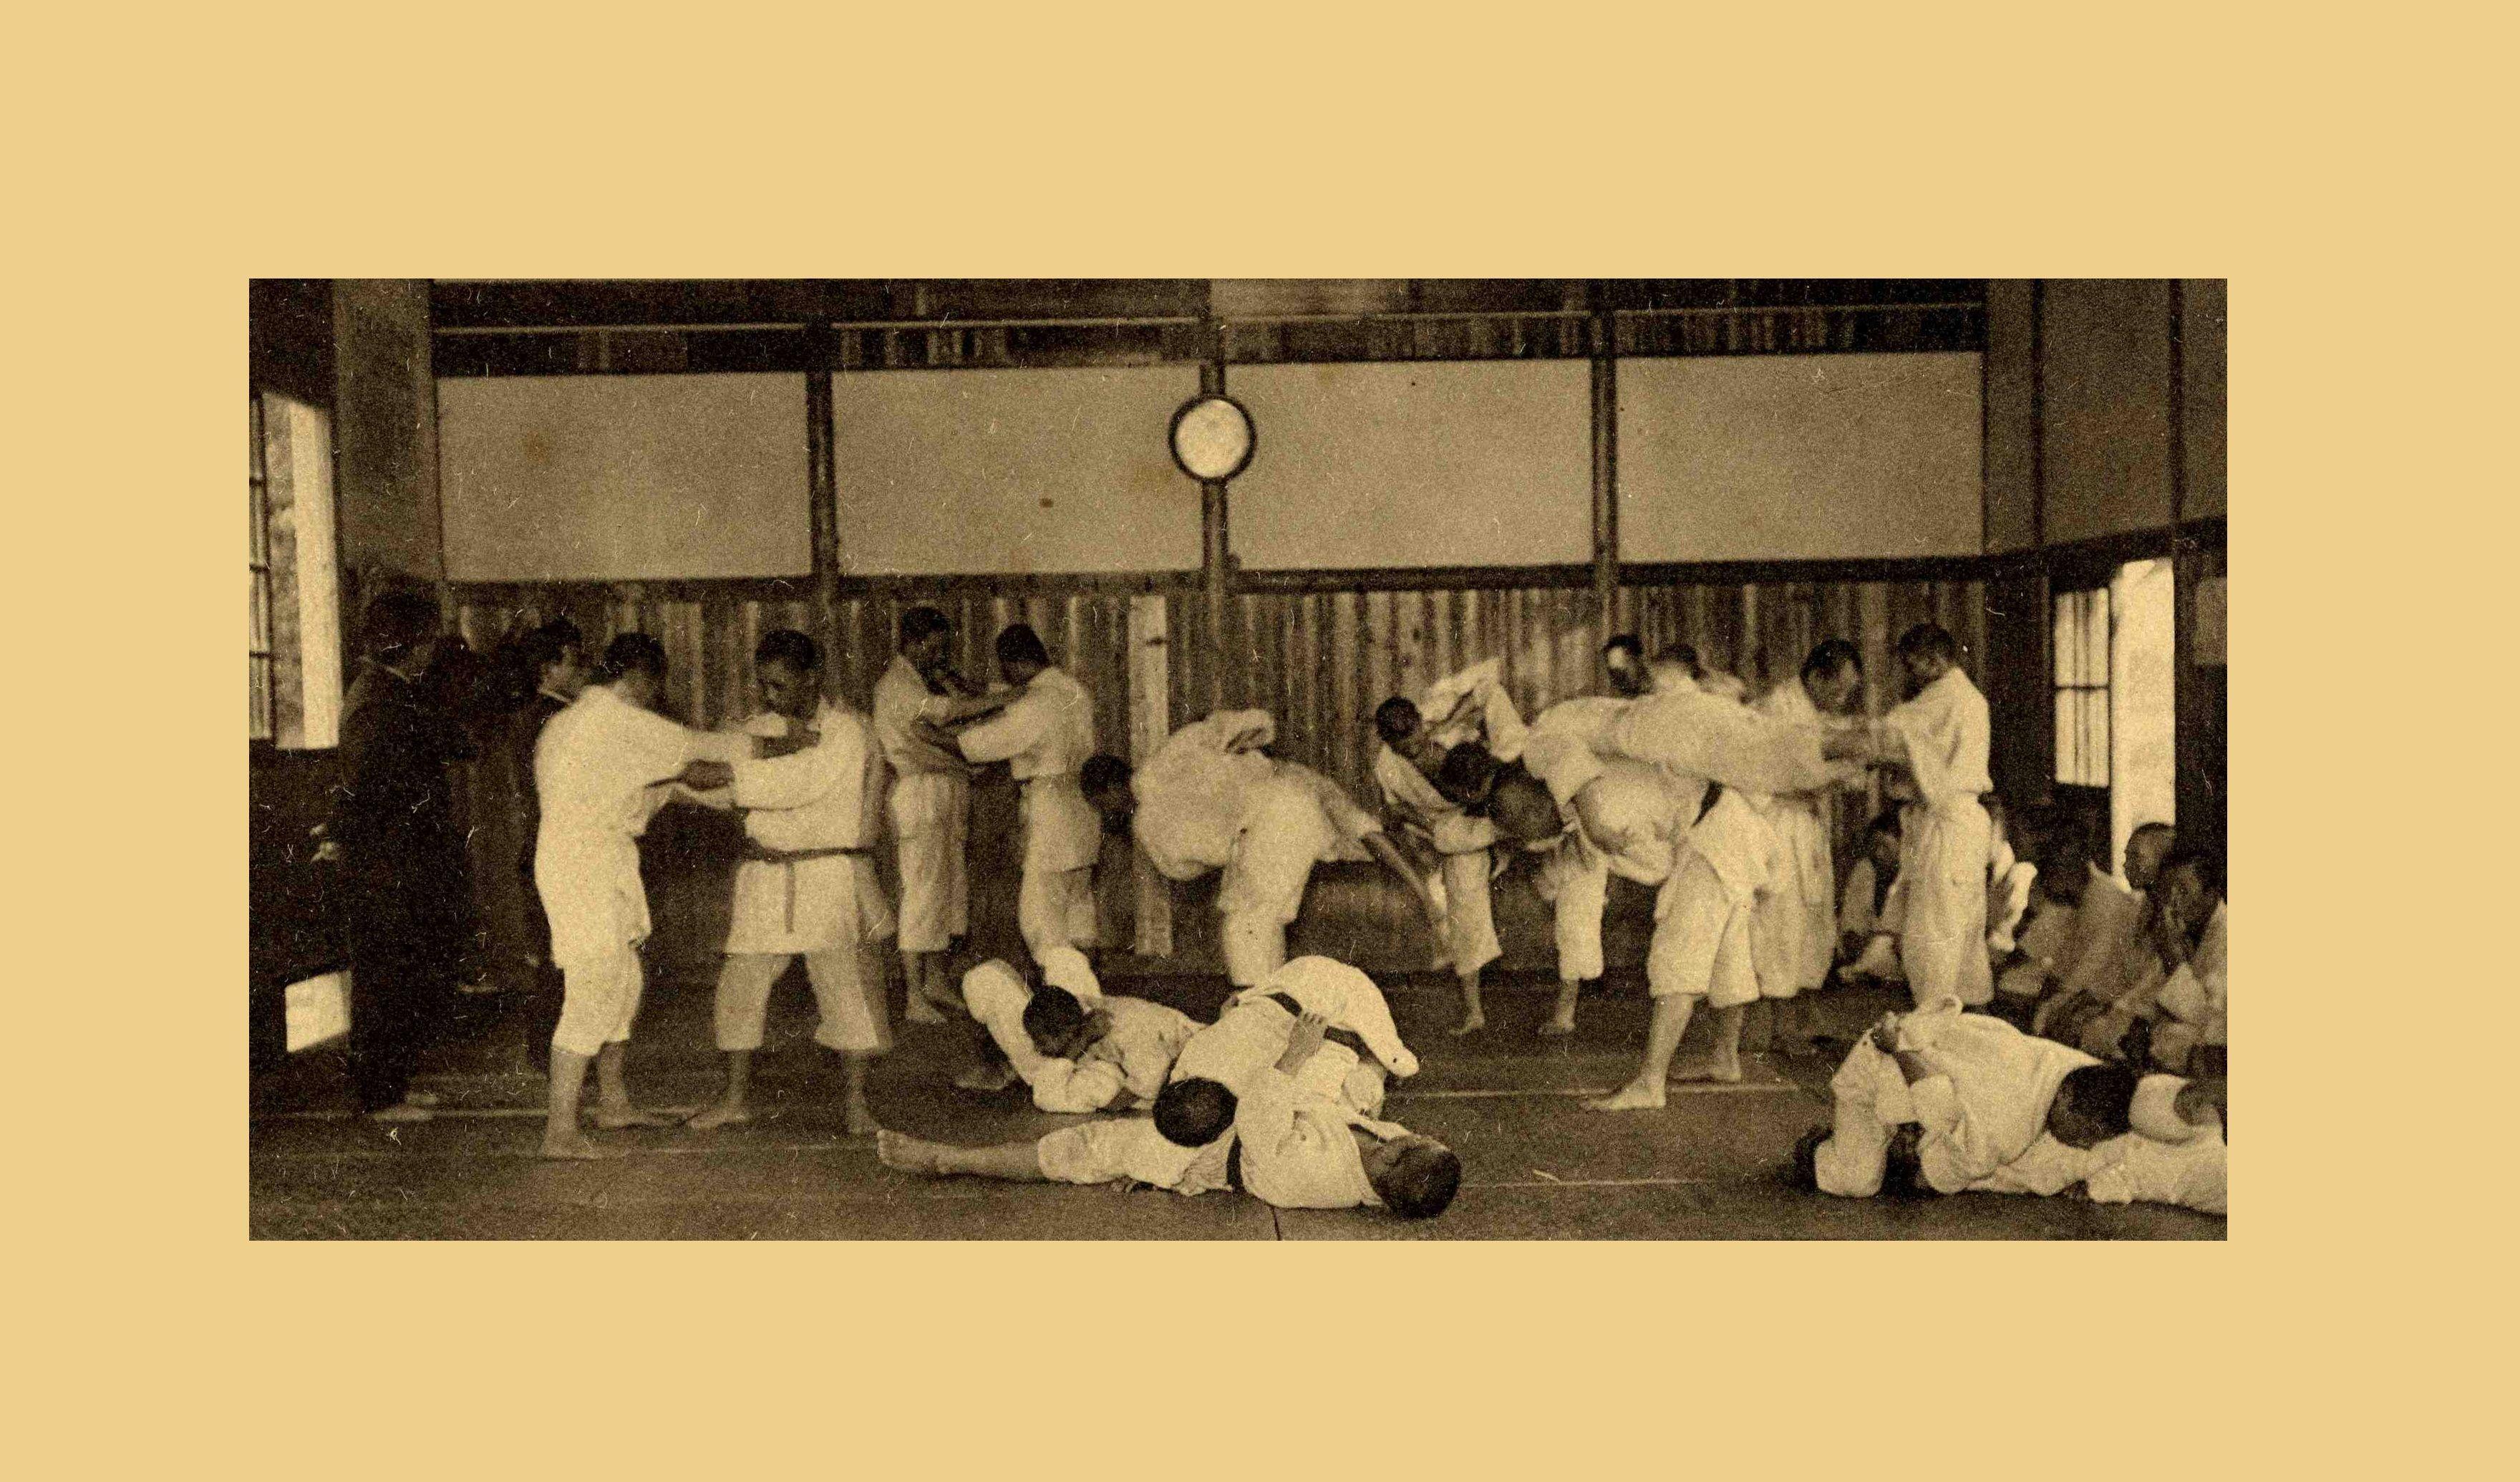 臺北州立臺北工業學校(現今為國立台北科技大學)的柔道社 The judo club in the dormitory of Taihoku Prefectural Industrial School  (now as National Taipei University of Technology) during Japanese colonization. Source: http://content.teldap.tw/index/blog/?p=1664